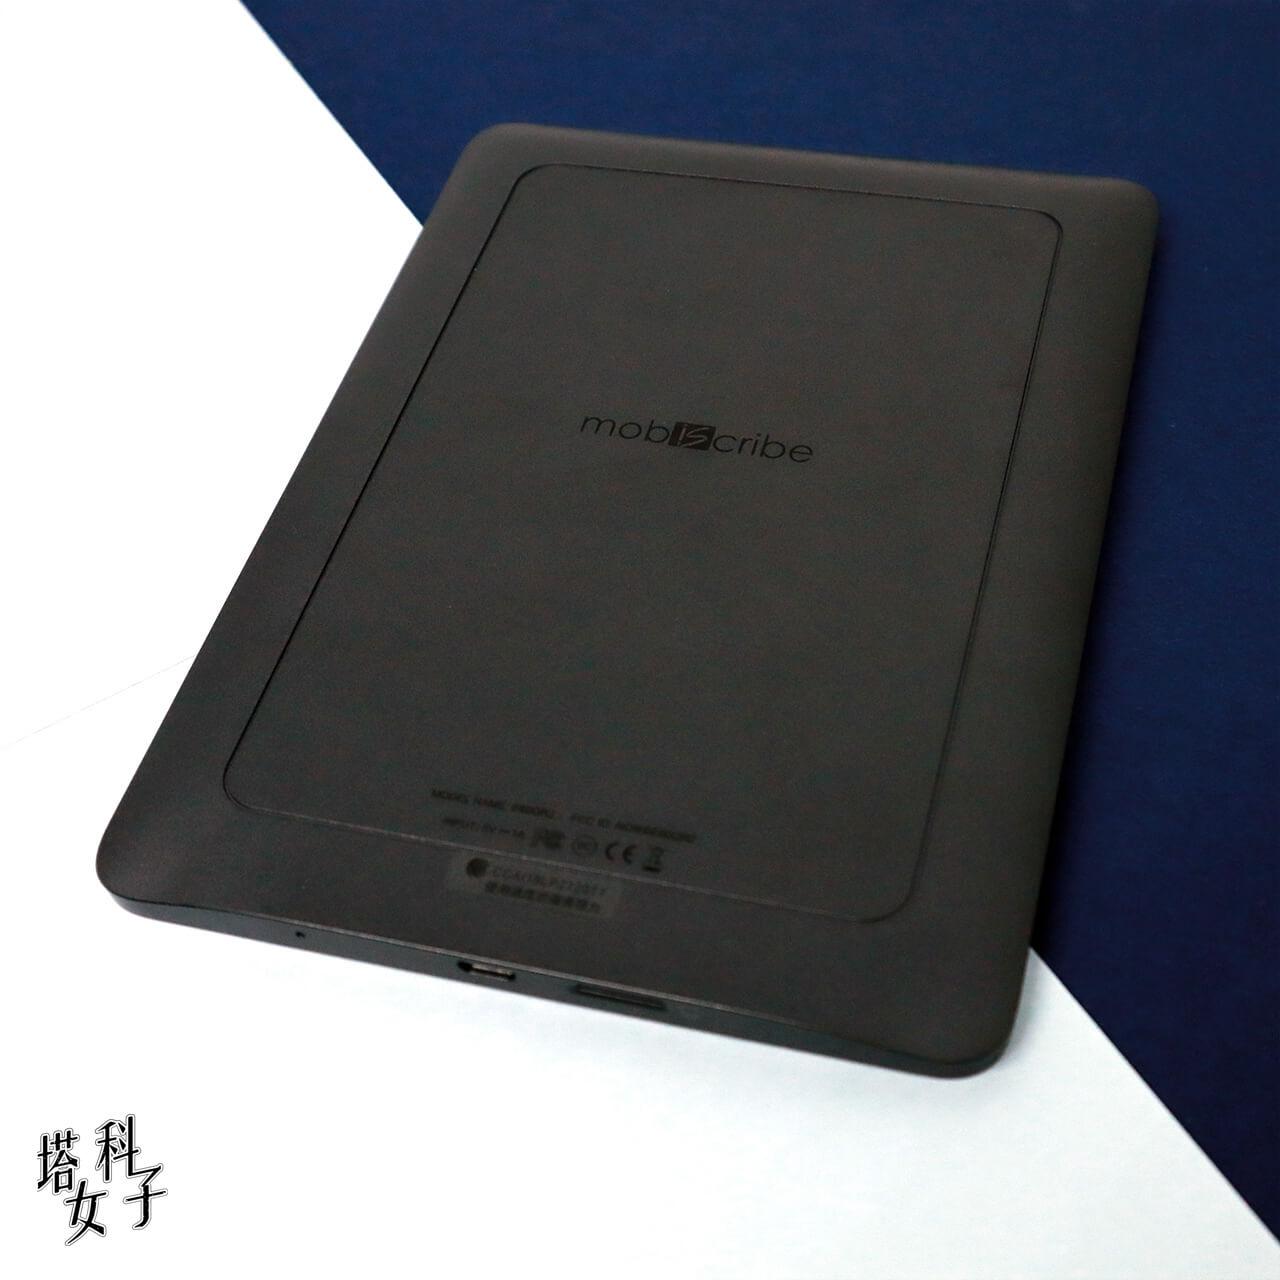 Mobiscribe 電子筆記本/閱讀器 背面